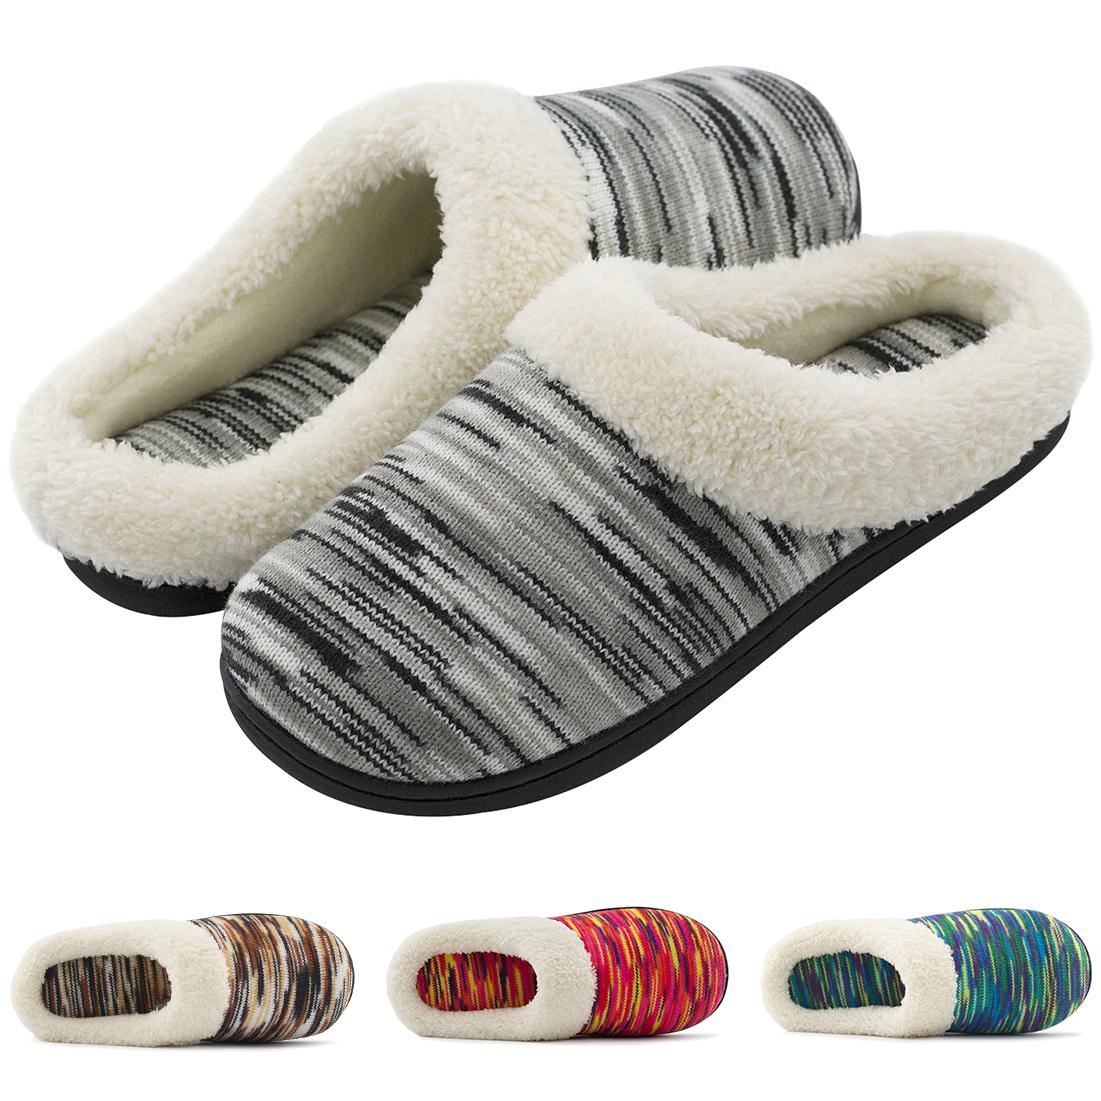 RockDove Women's Memory Foam Woolen Slippers, Washable House Shoes w/Indoor Outdoor Sole 31% OFF @$11.72+FS